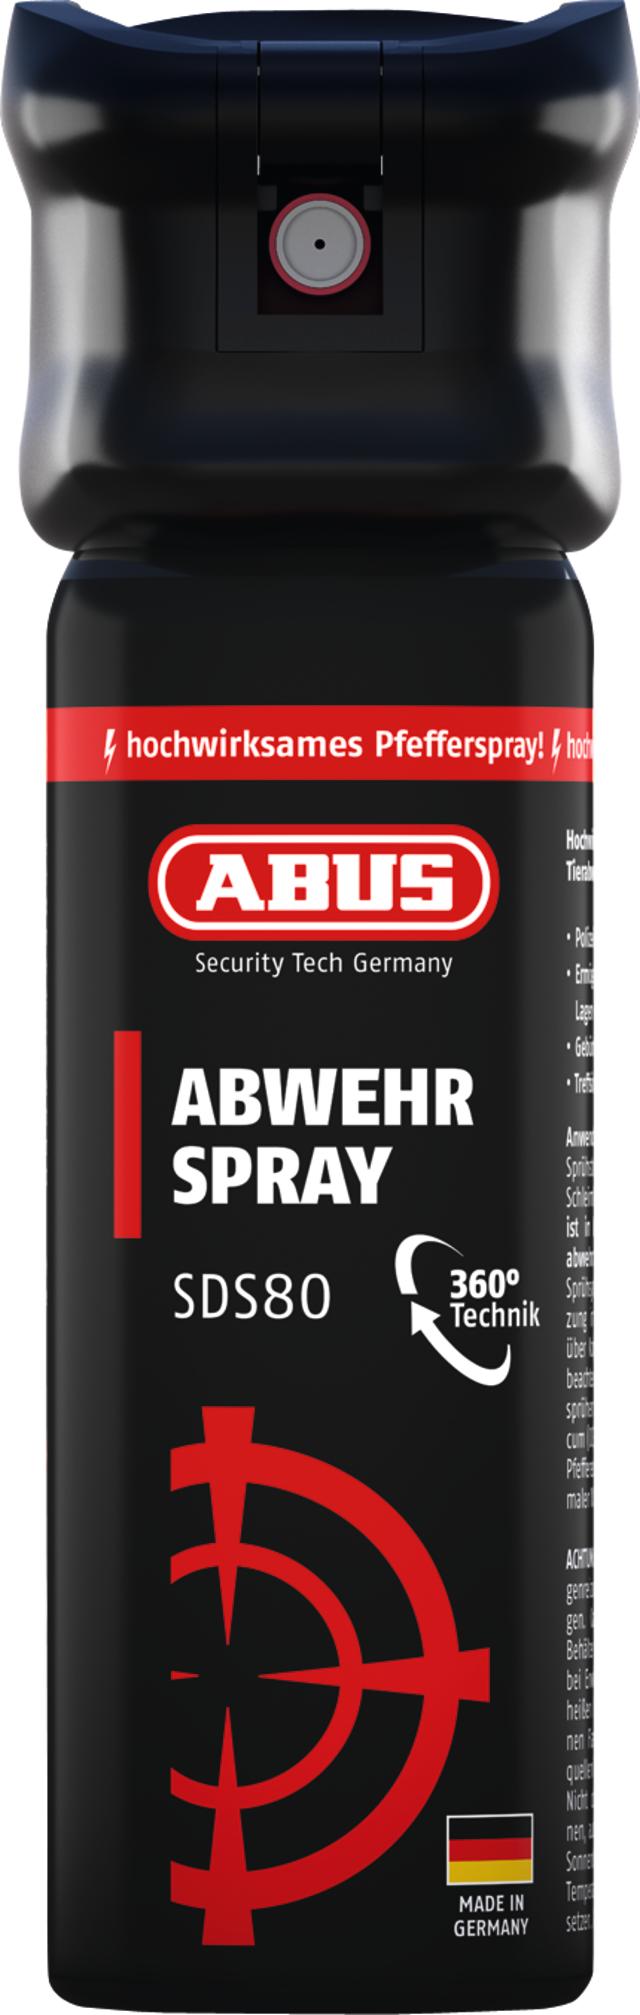 Abwehrspray SDS80